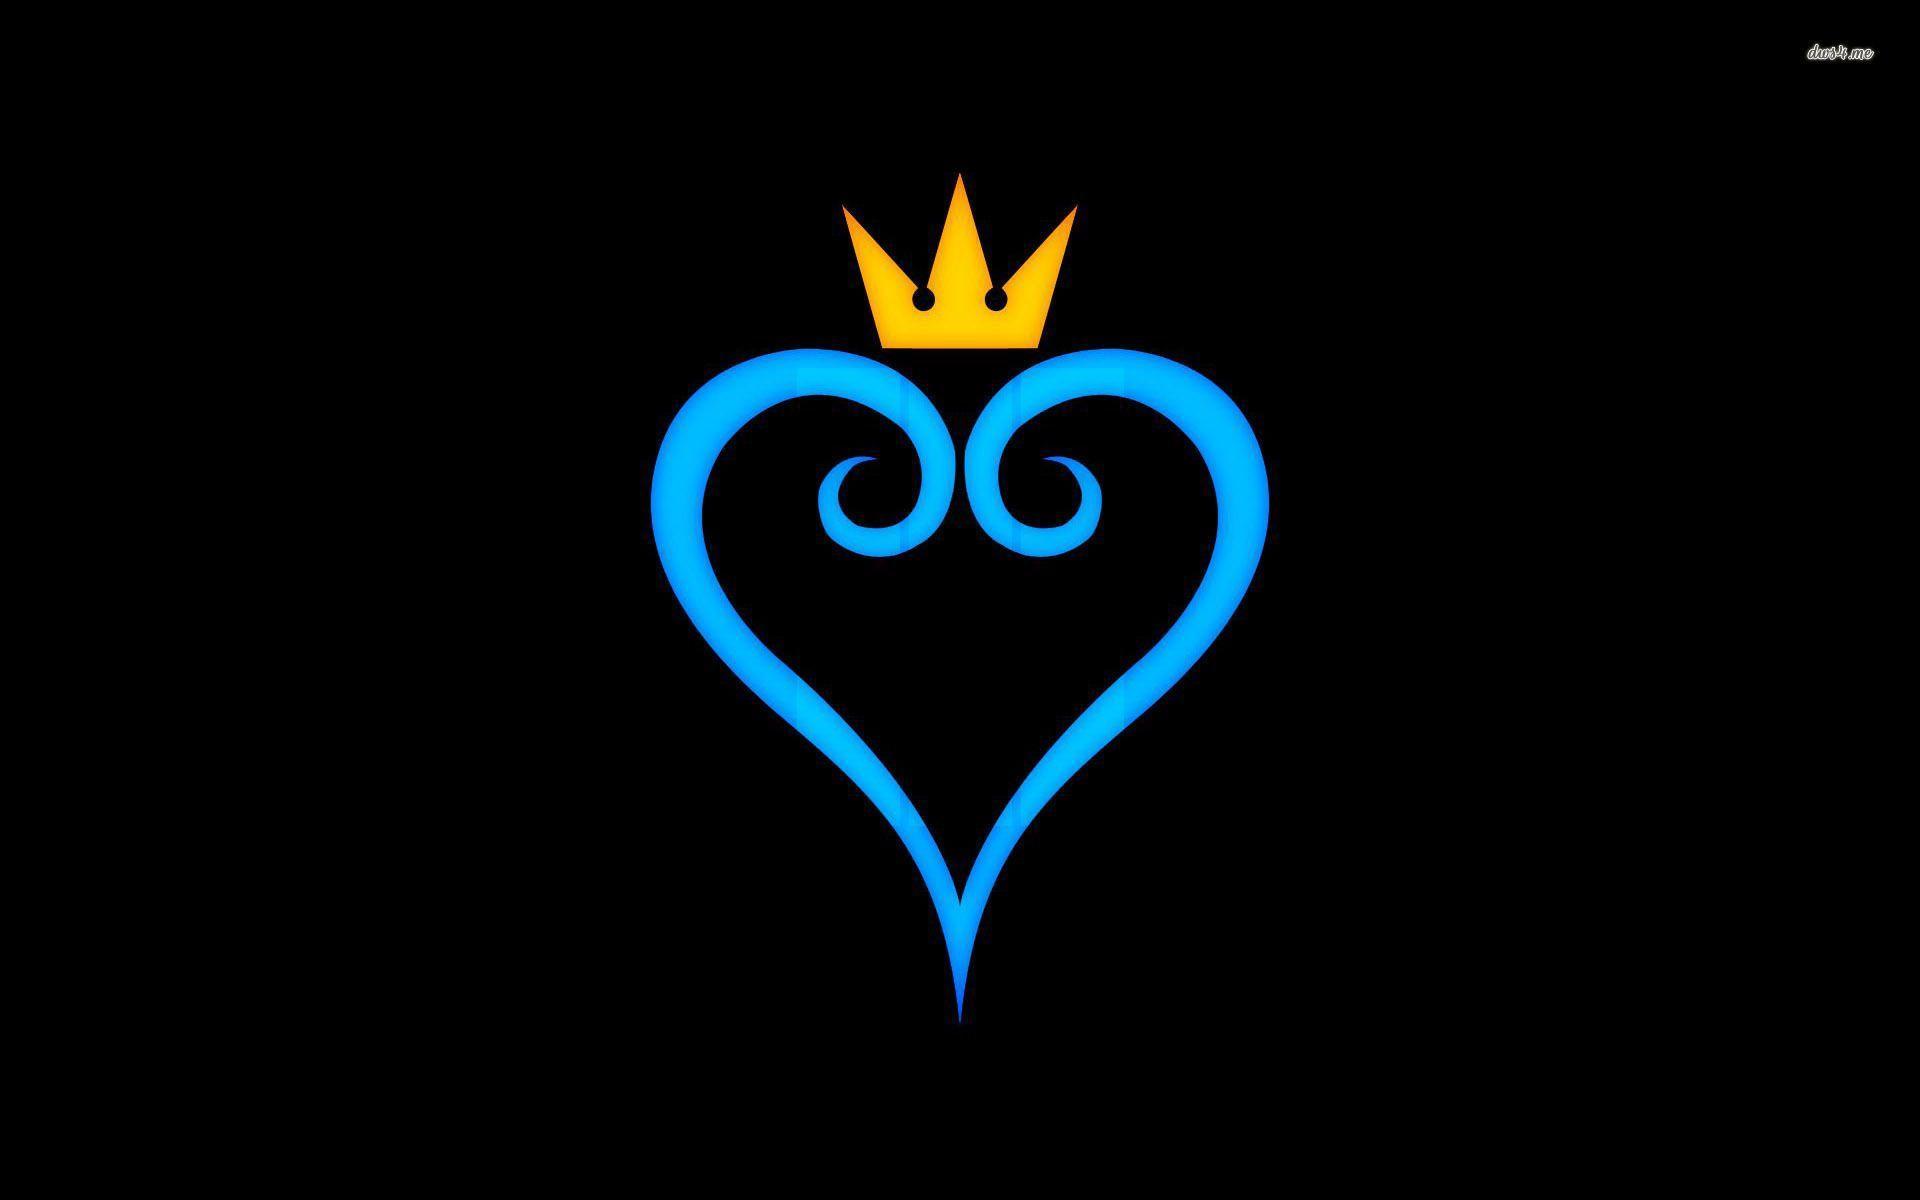 Free Kingdom Hearts Wallpaper 1080p Long Wallpapers